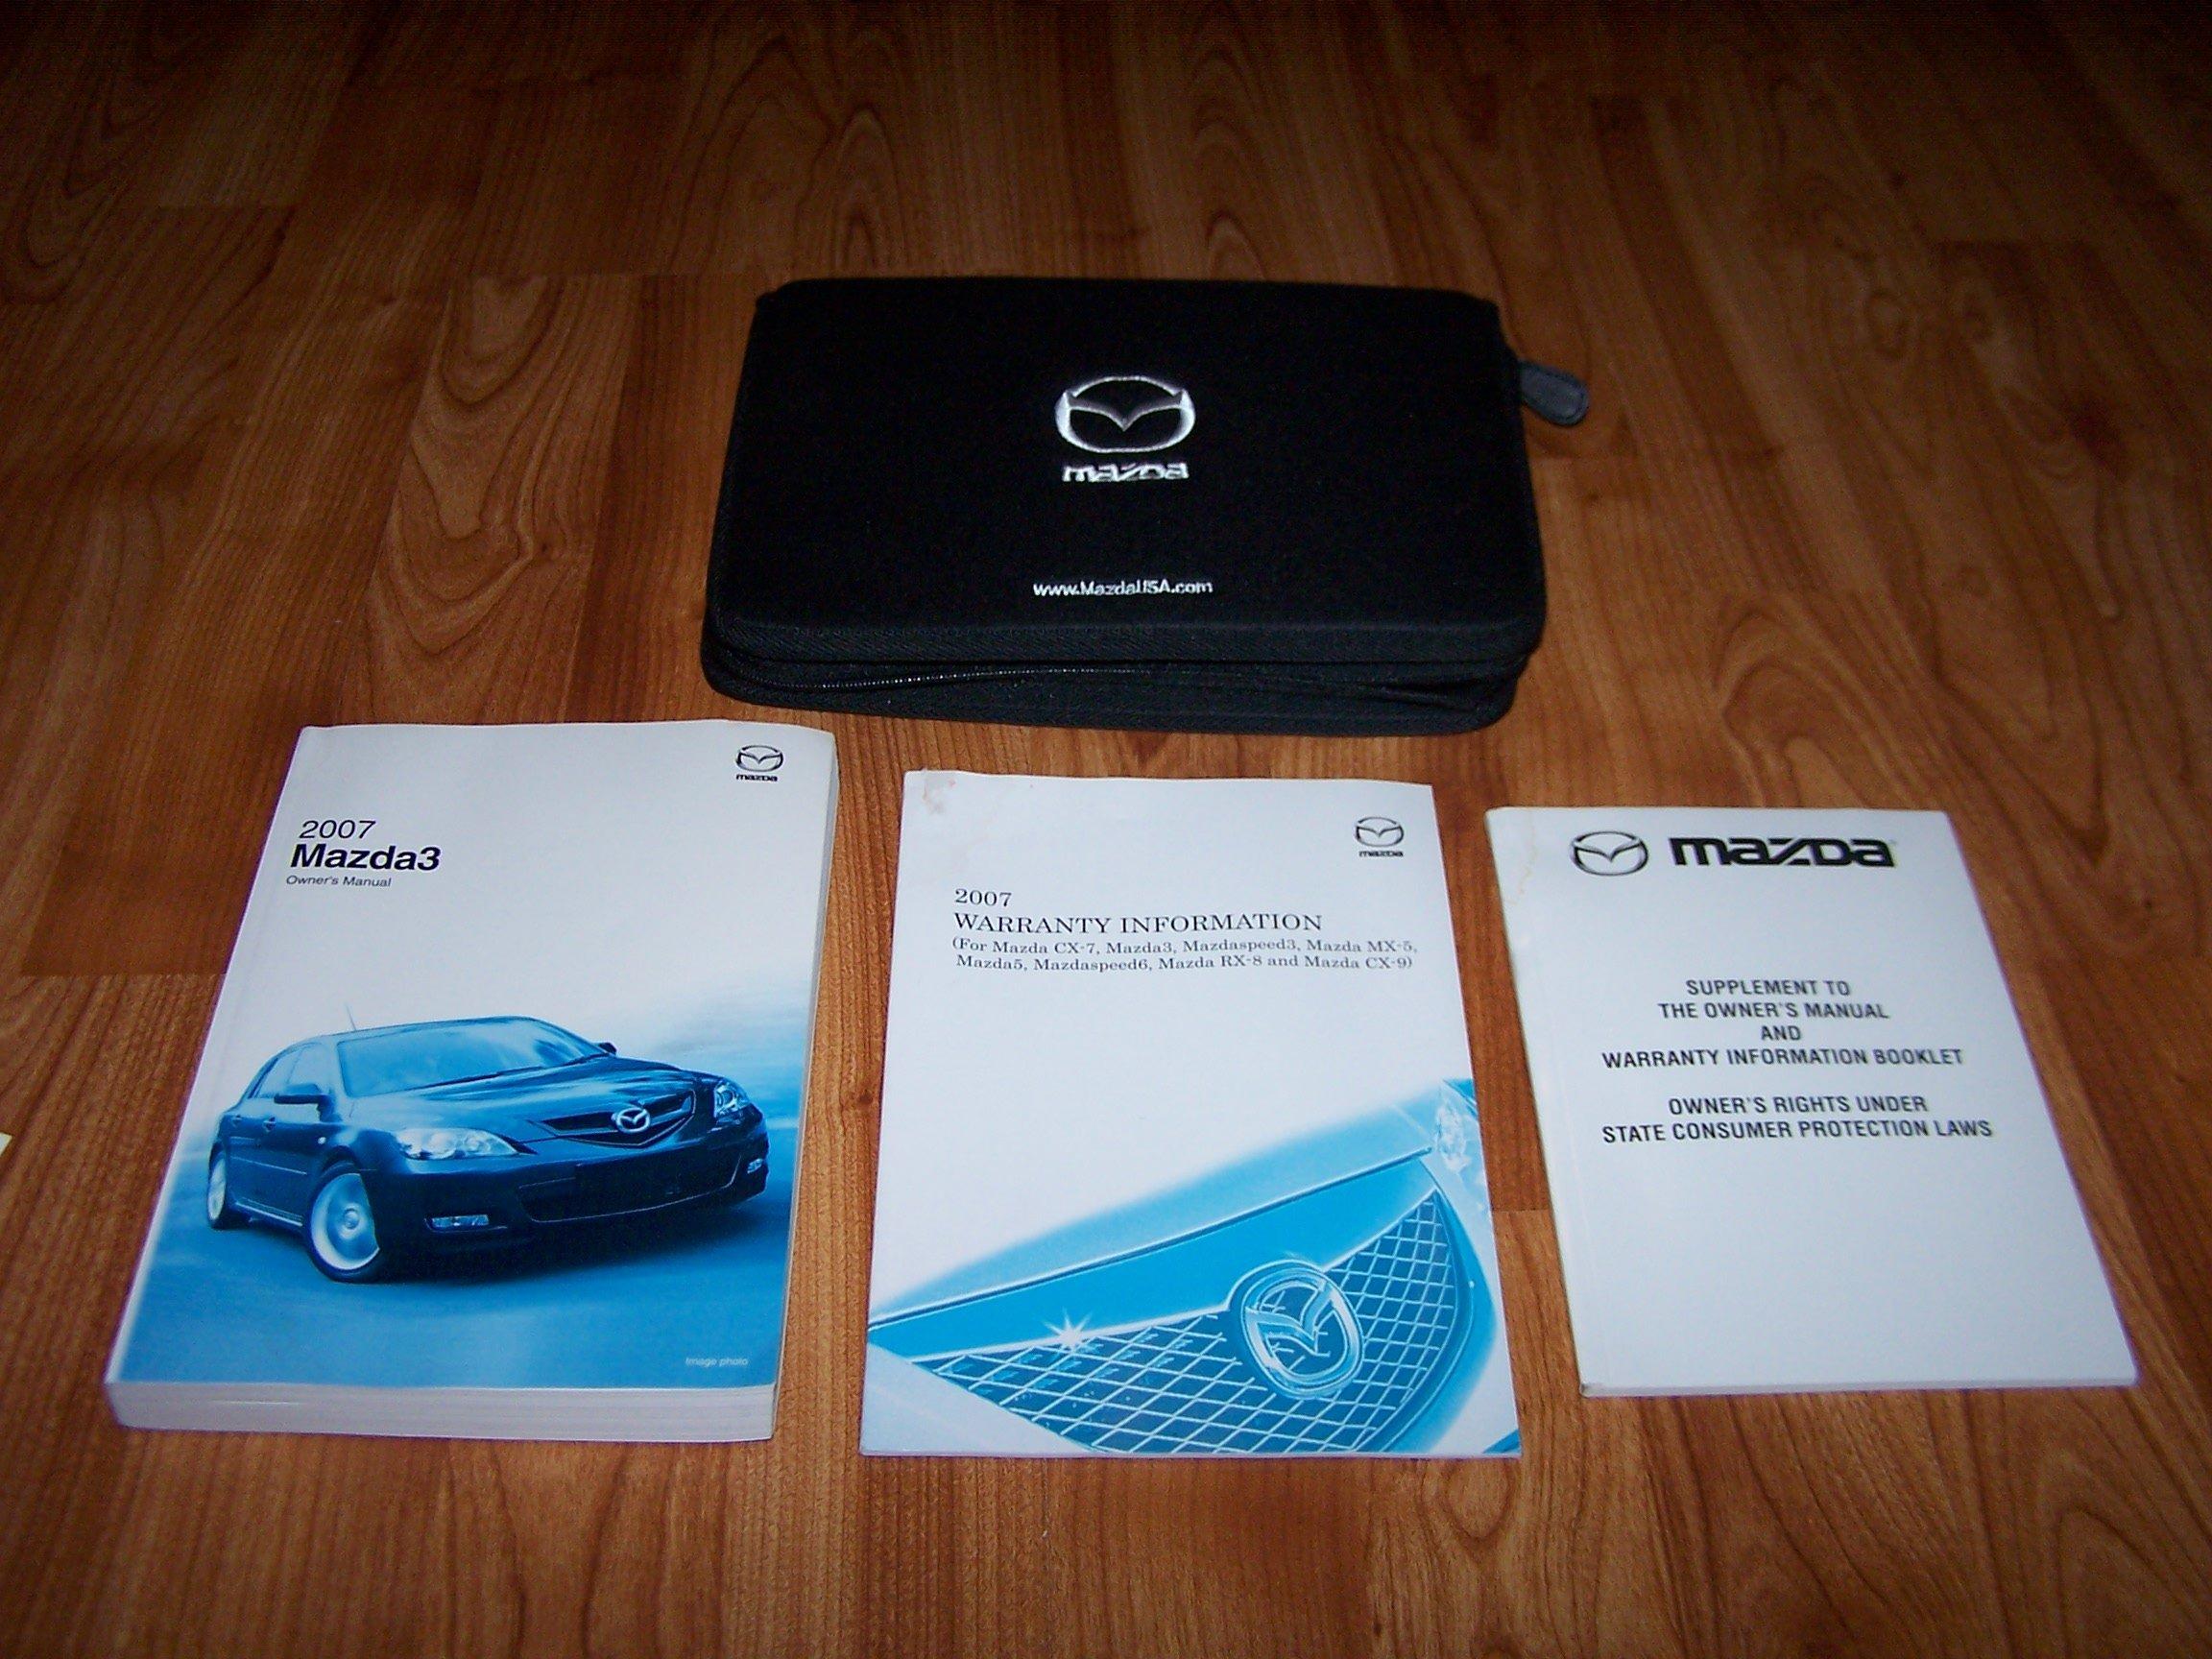 Mazda mazda3 owner manuals [2004-2019] | ownermanual.